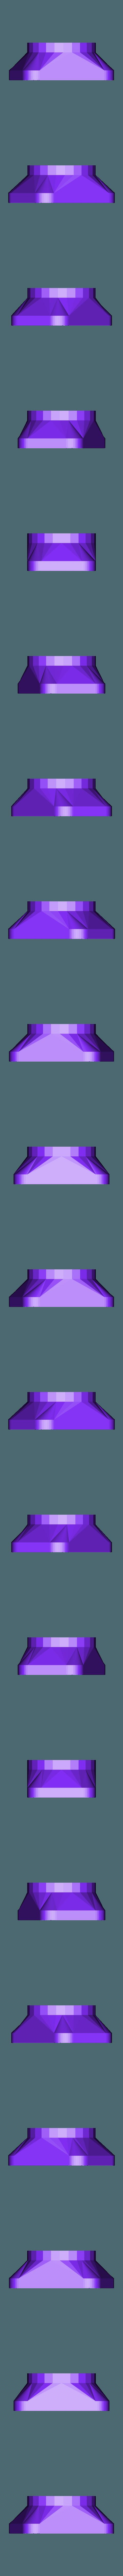 Lens_Hood_V3.stl Download free STL file Not a LAMP - It is not a lamp - Camera lamp • 3D printing model, Gonzalor